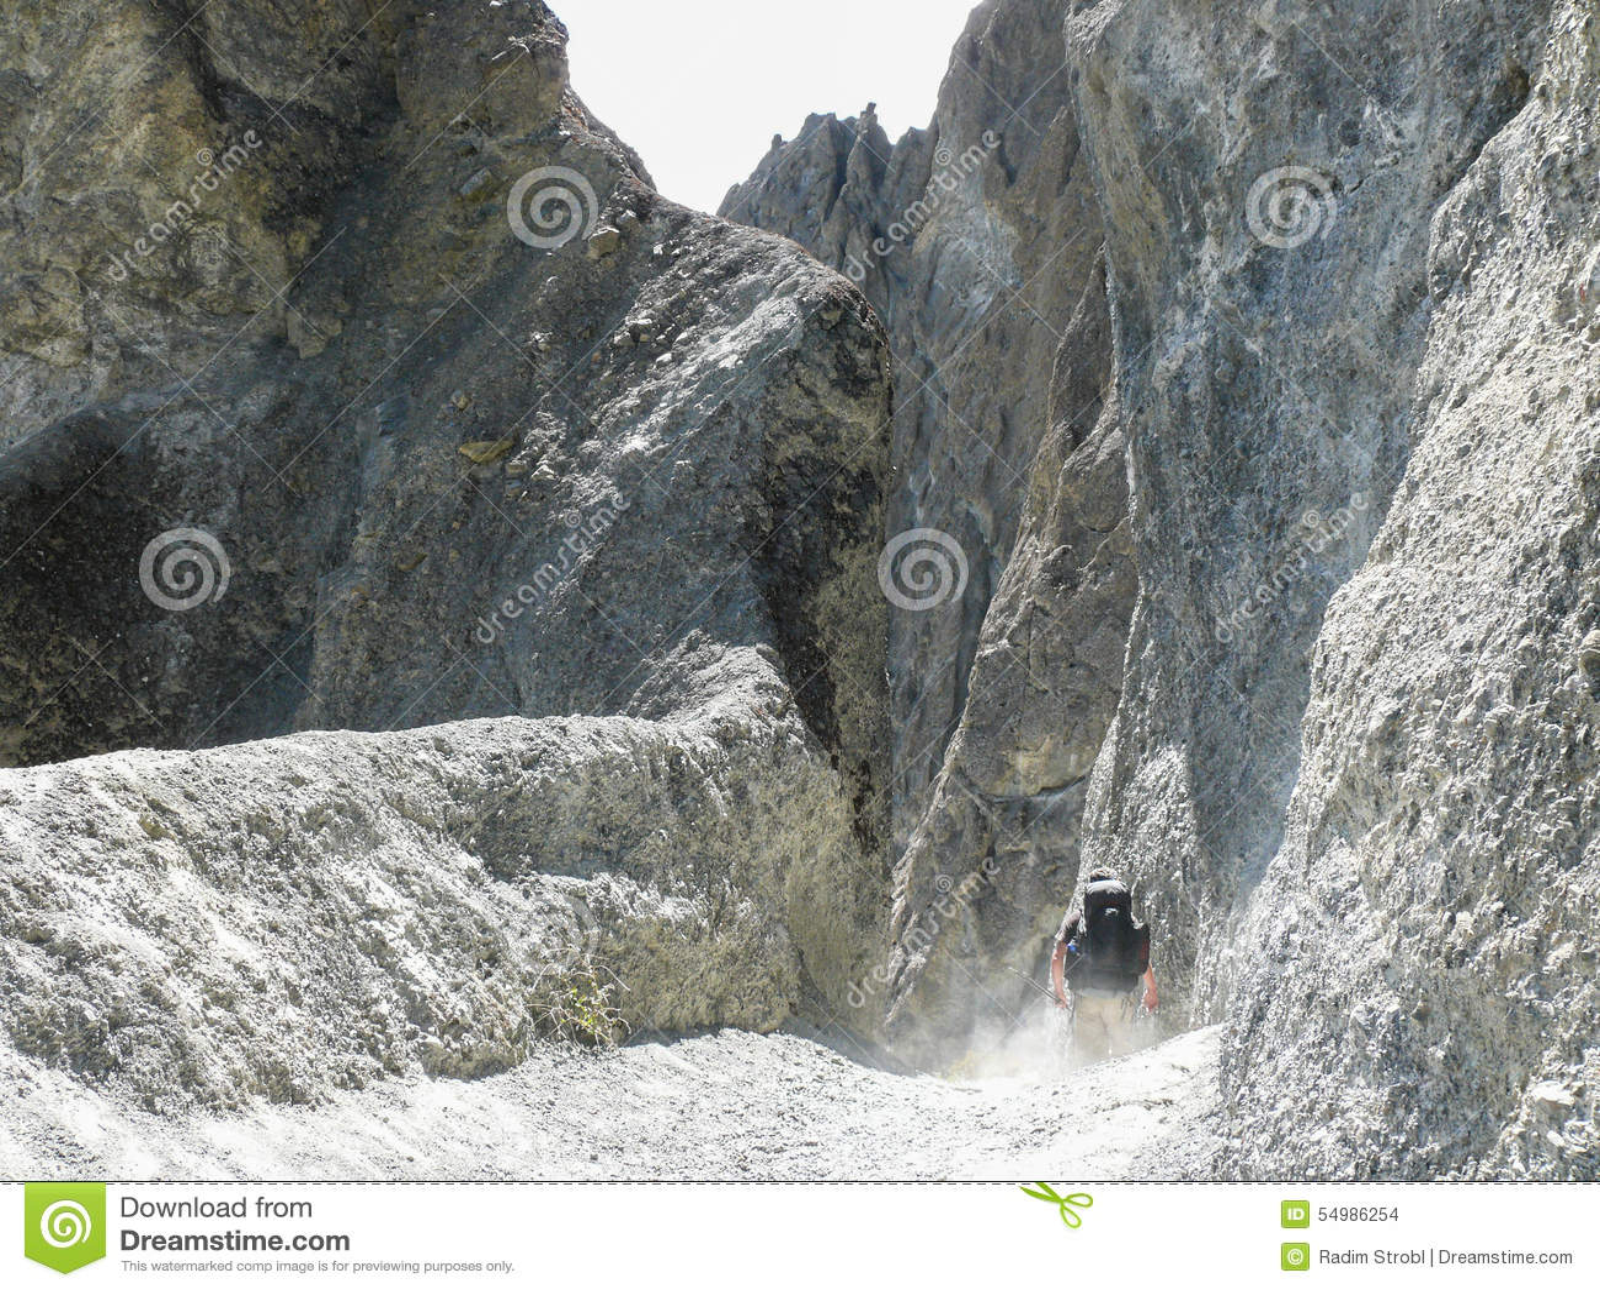 Landslide area - way to Tilicho base camp, Nepal